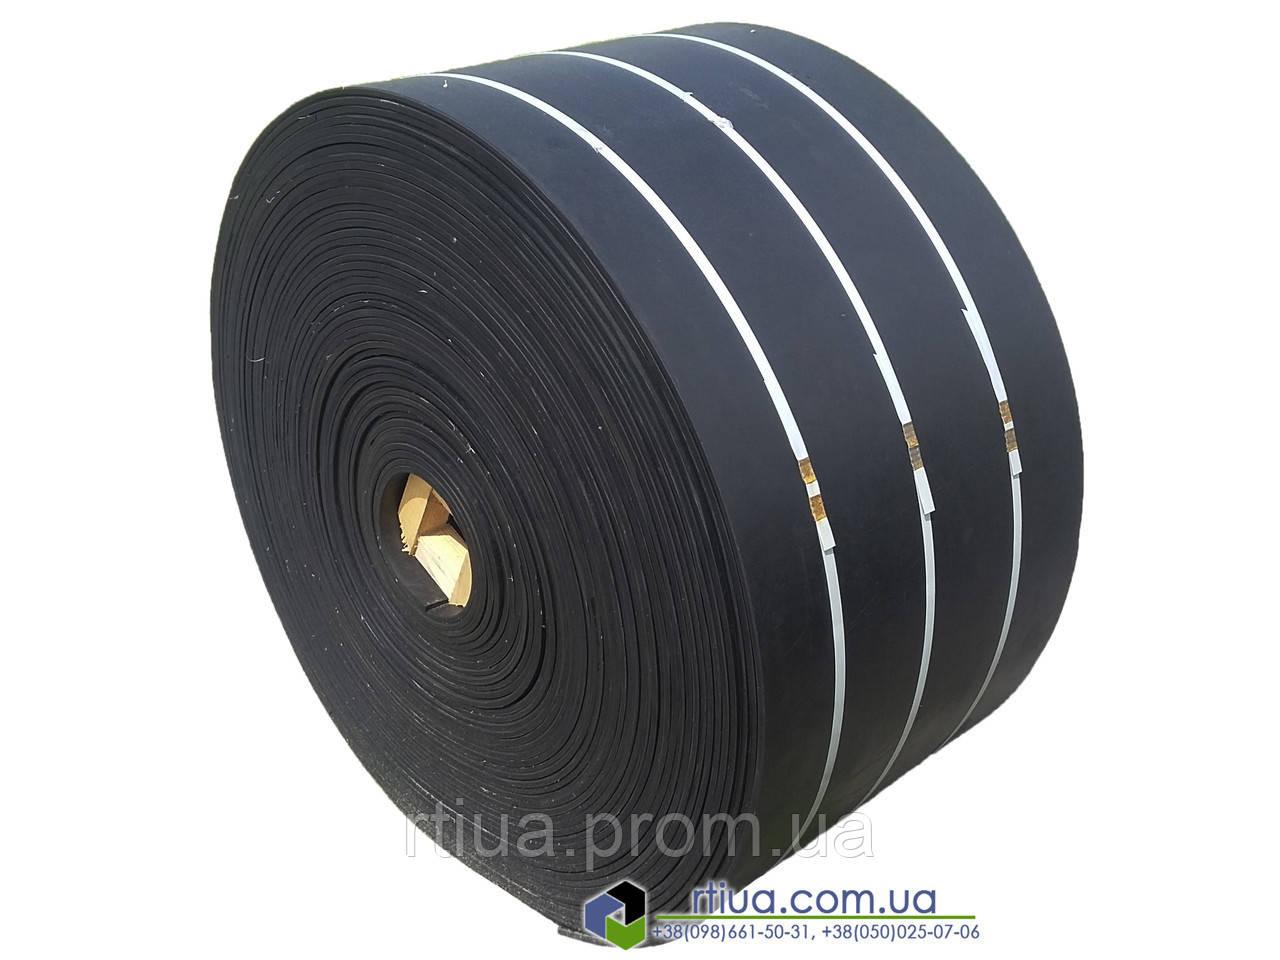 Конвейерная лента 400х10 мм